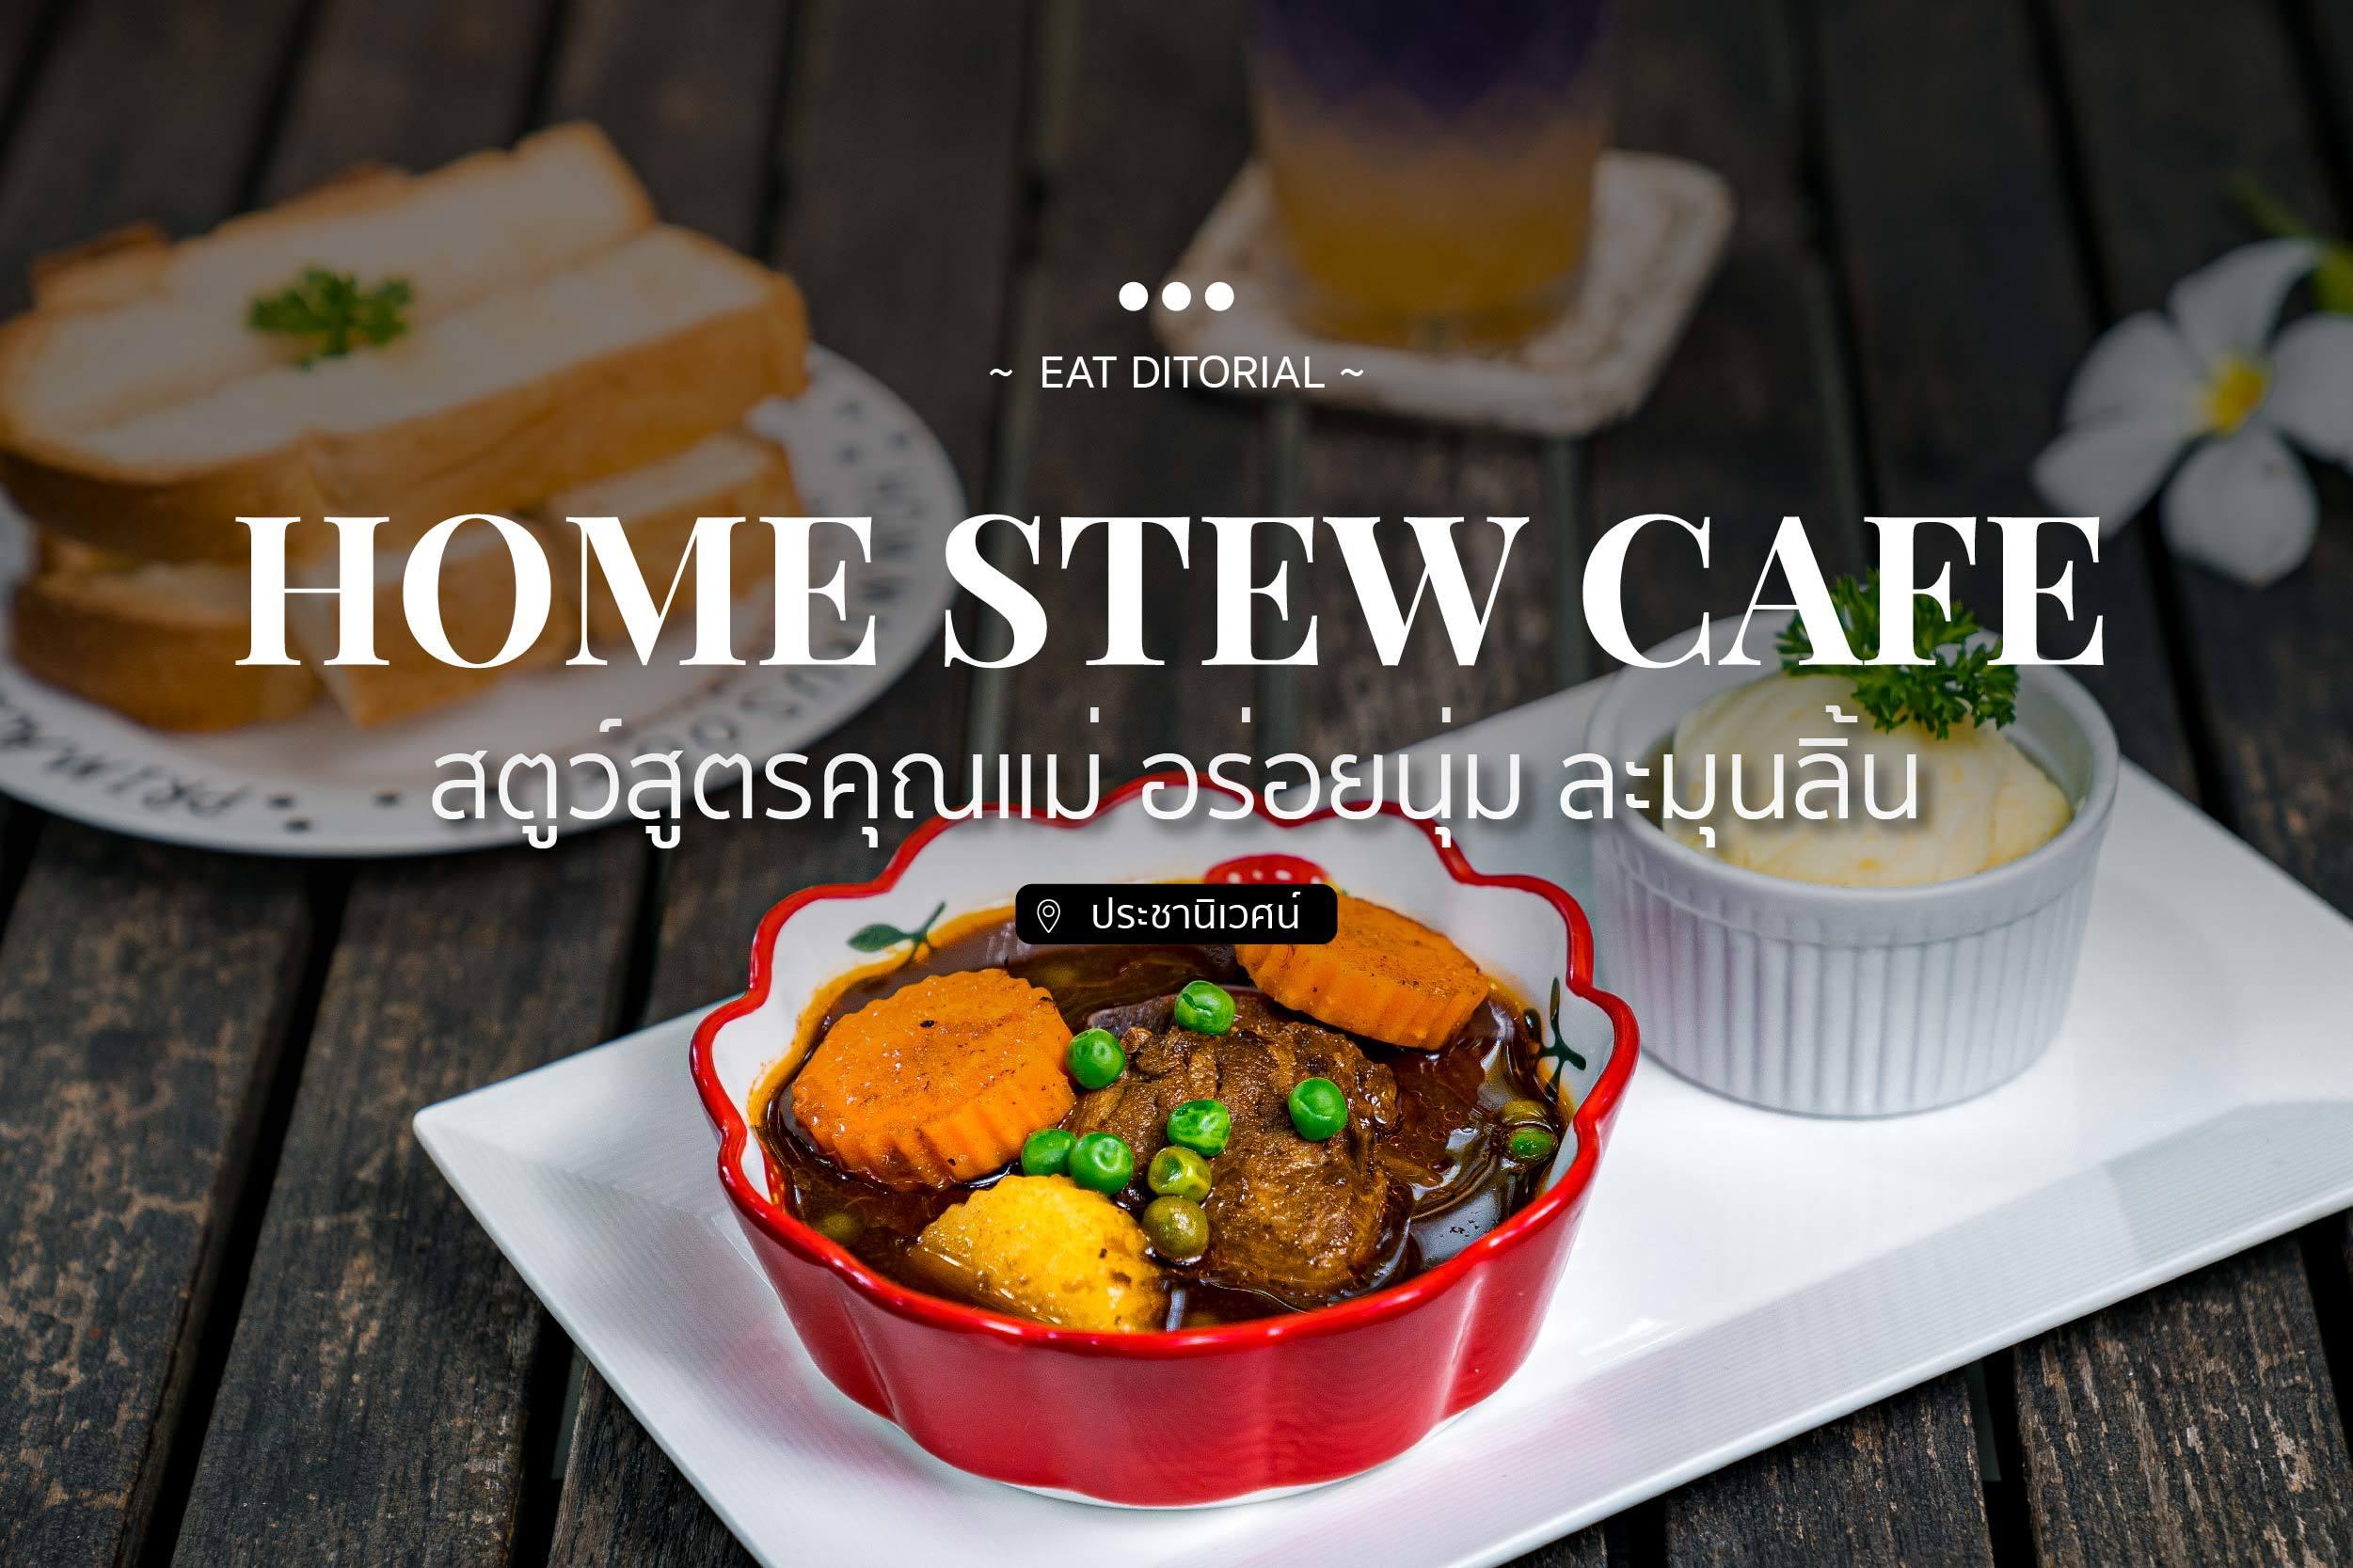 Home stew cafe ปกweb 58